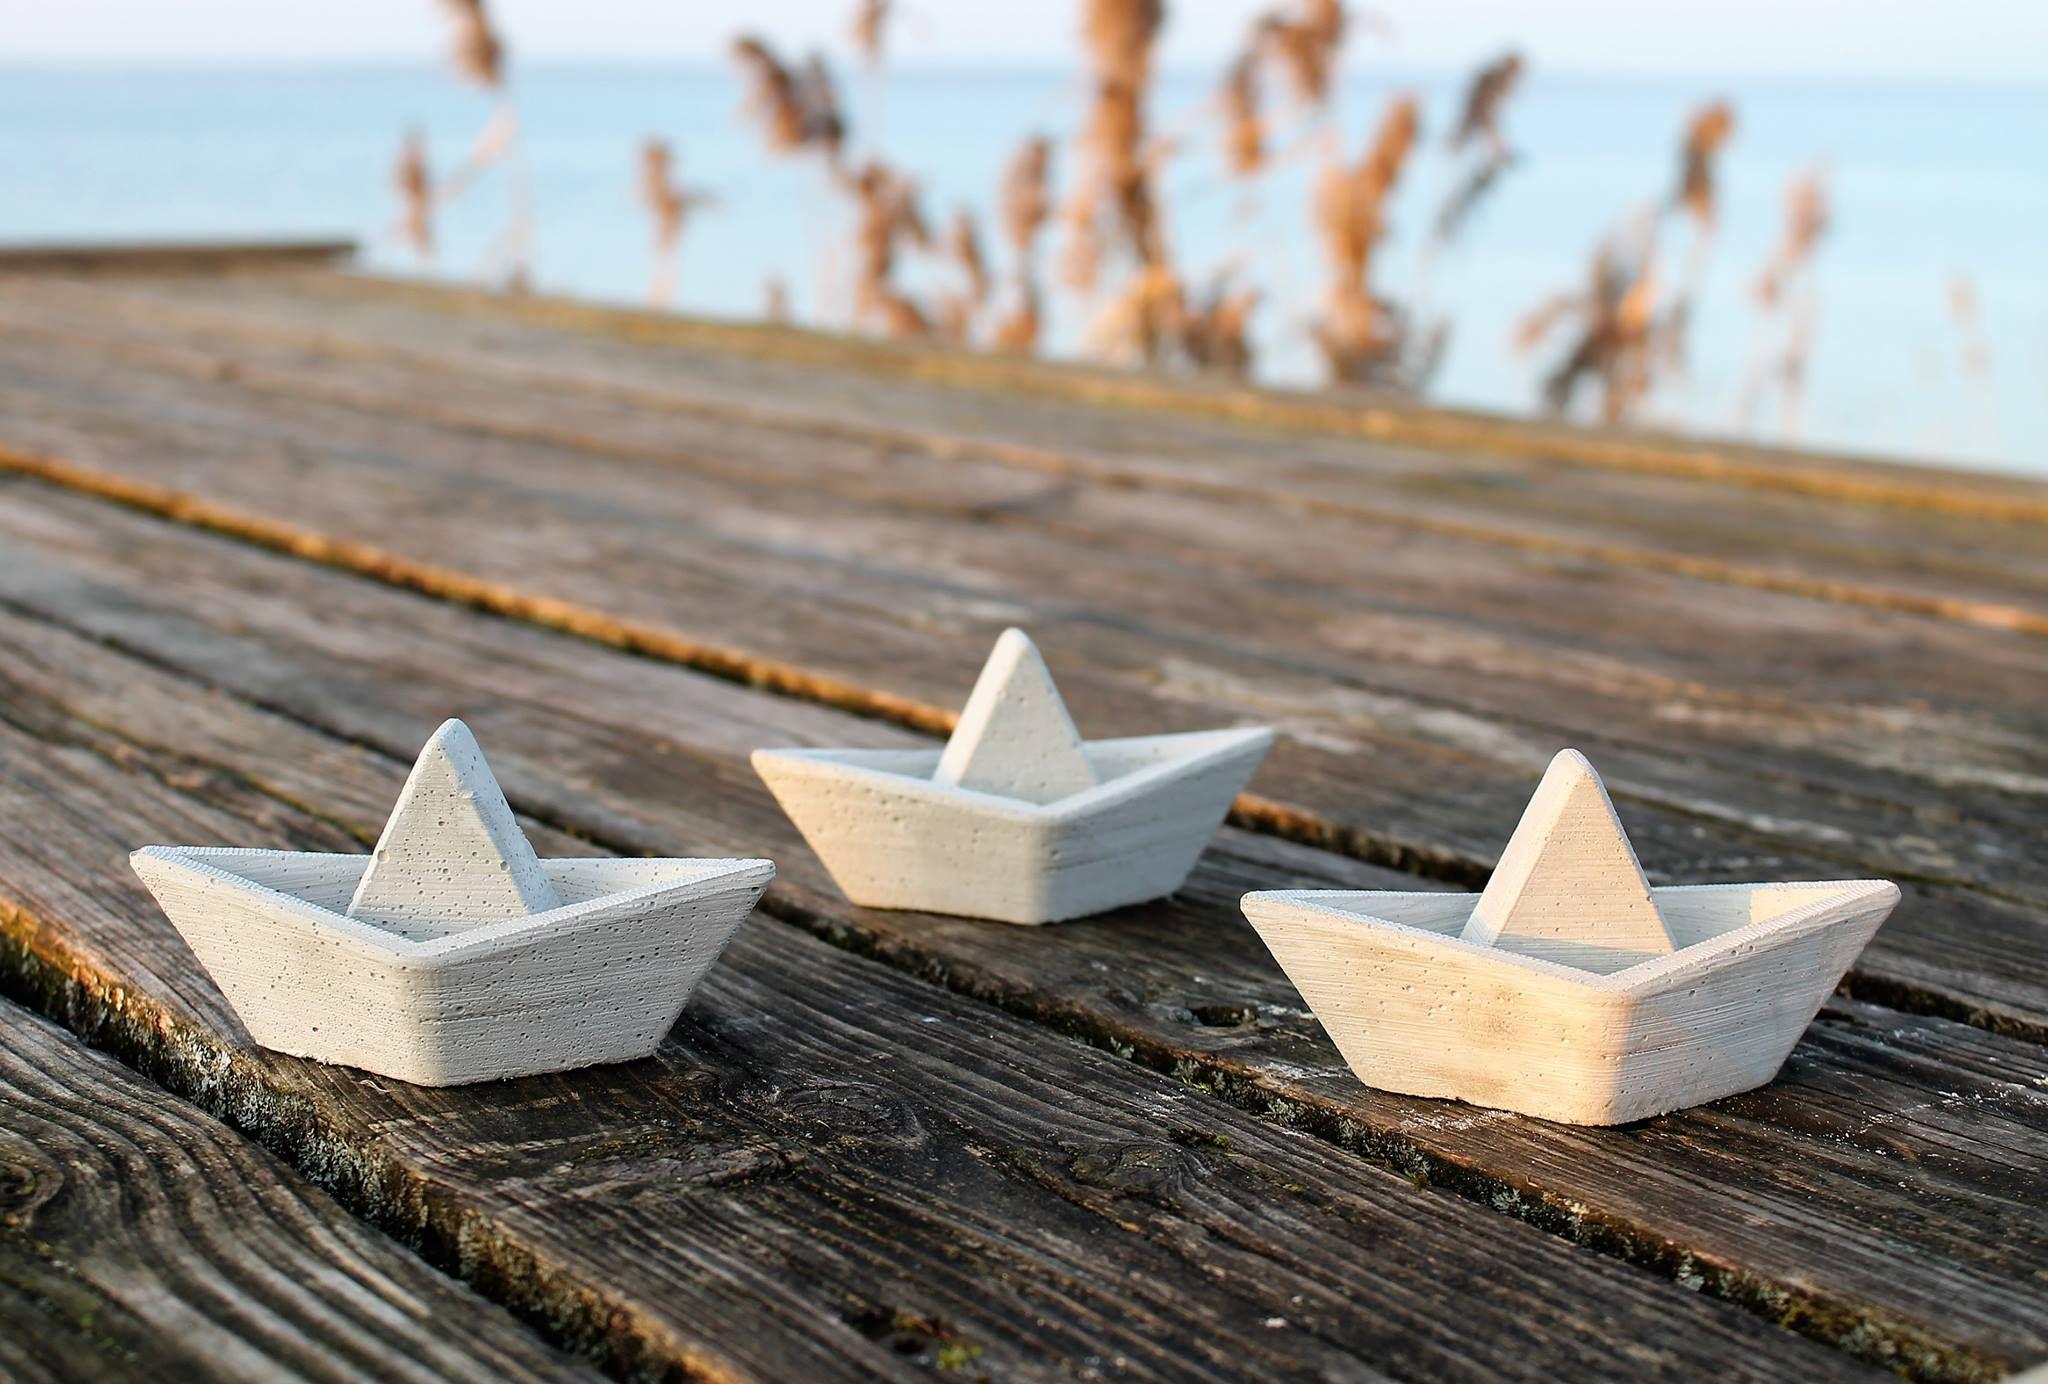 Böötchen, Boote, Papierboot, Beton, Beton gießen, Meerweh ...